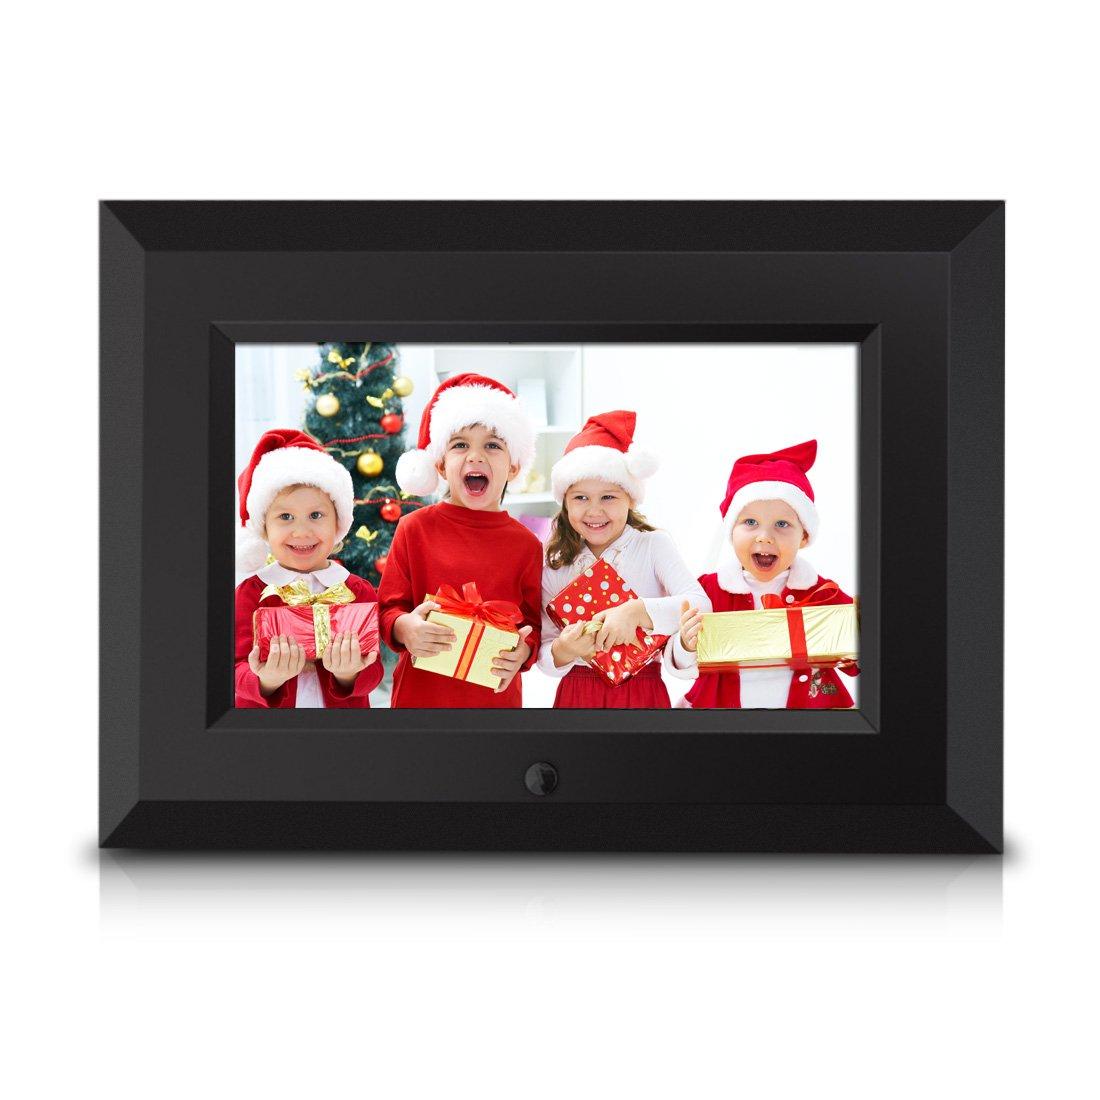 Amazoncom Sungale Ca705 7 Inch Digital Photo Frame Black